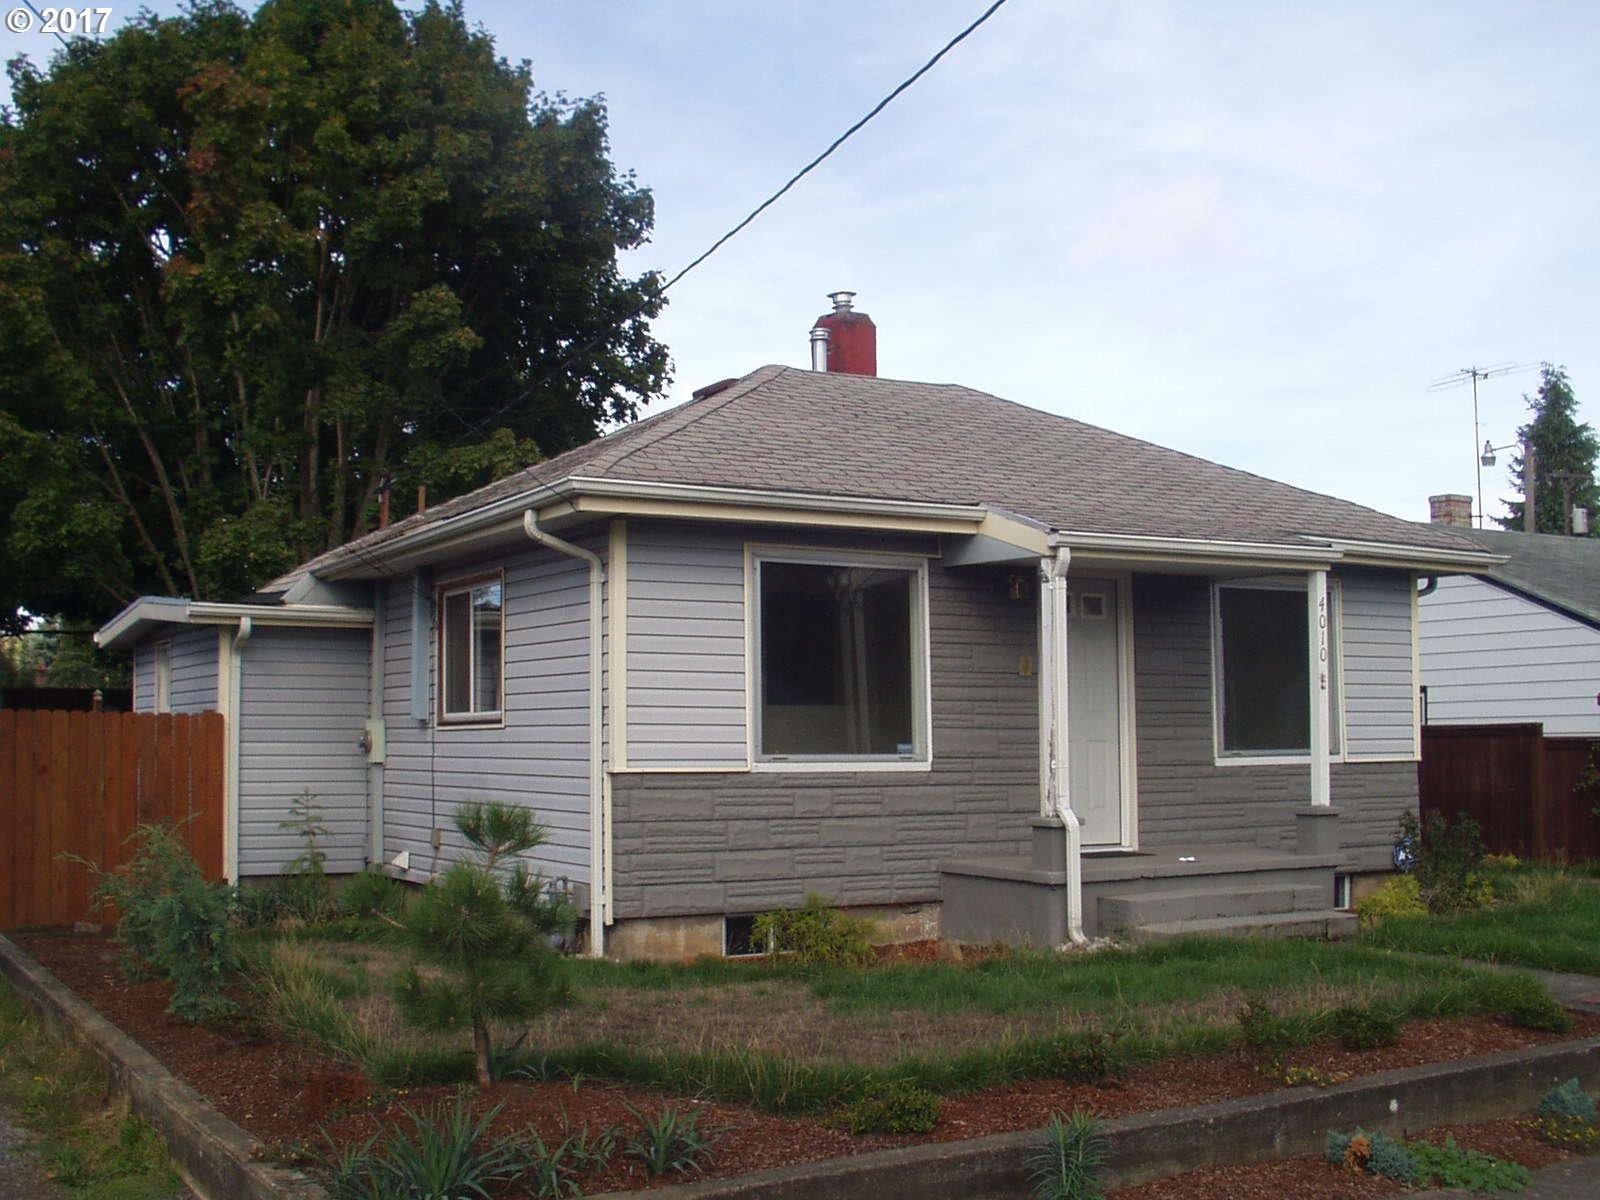 4010 NW COLUMBIA ST, Vancouver, WA 98660